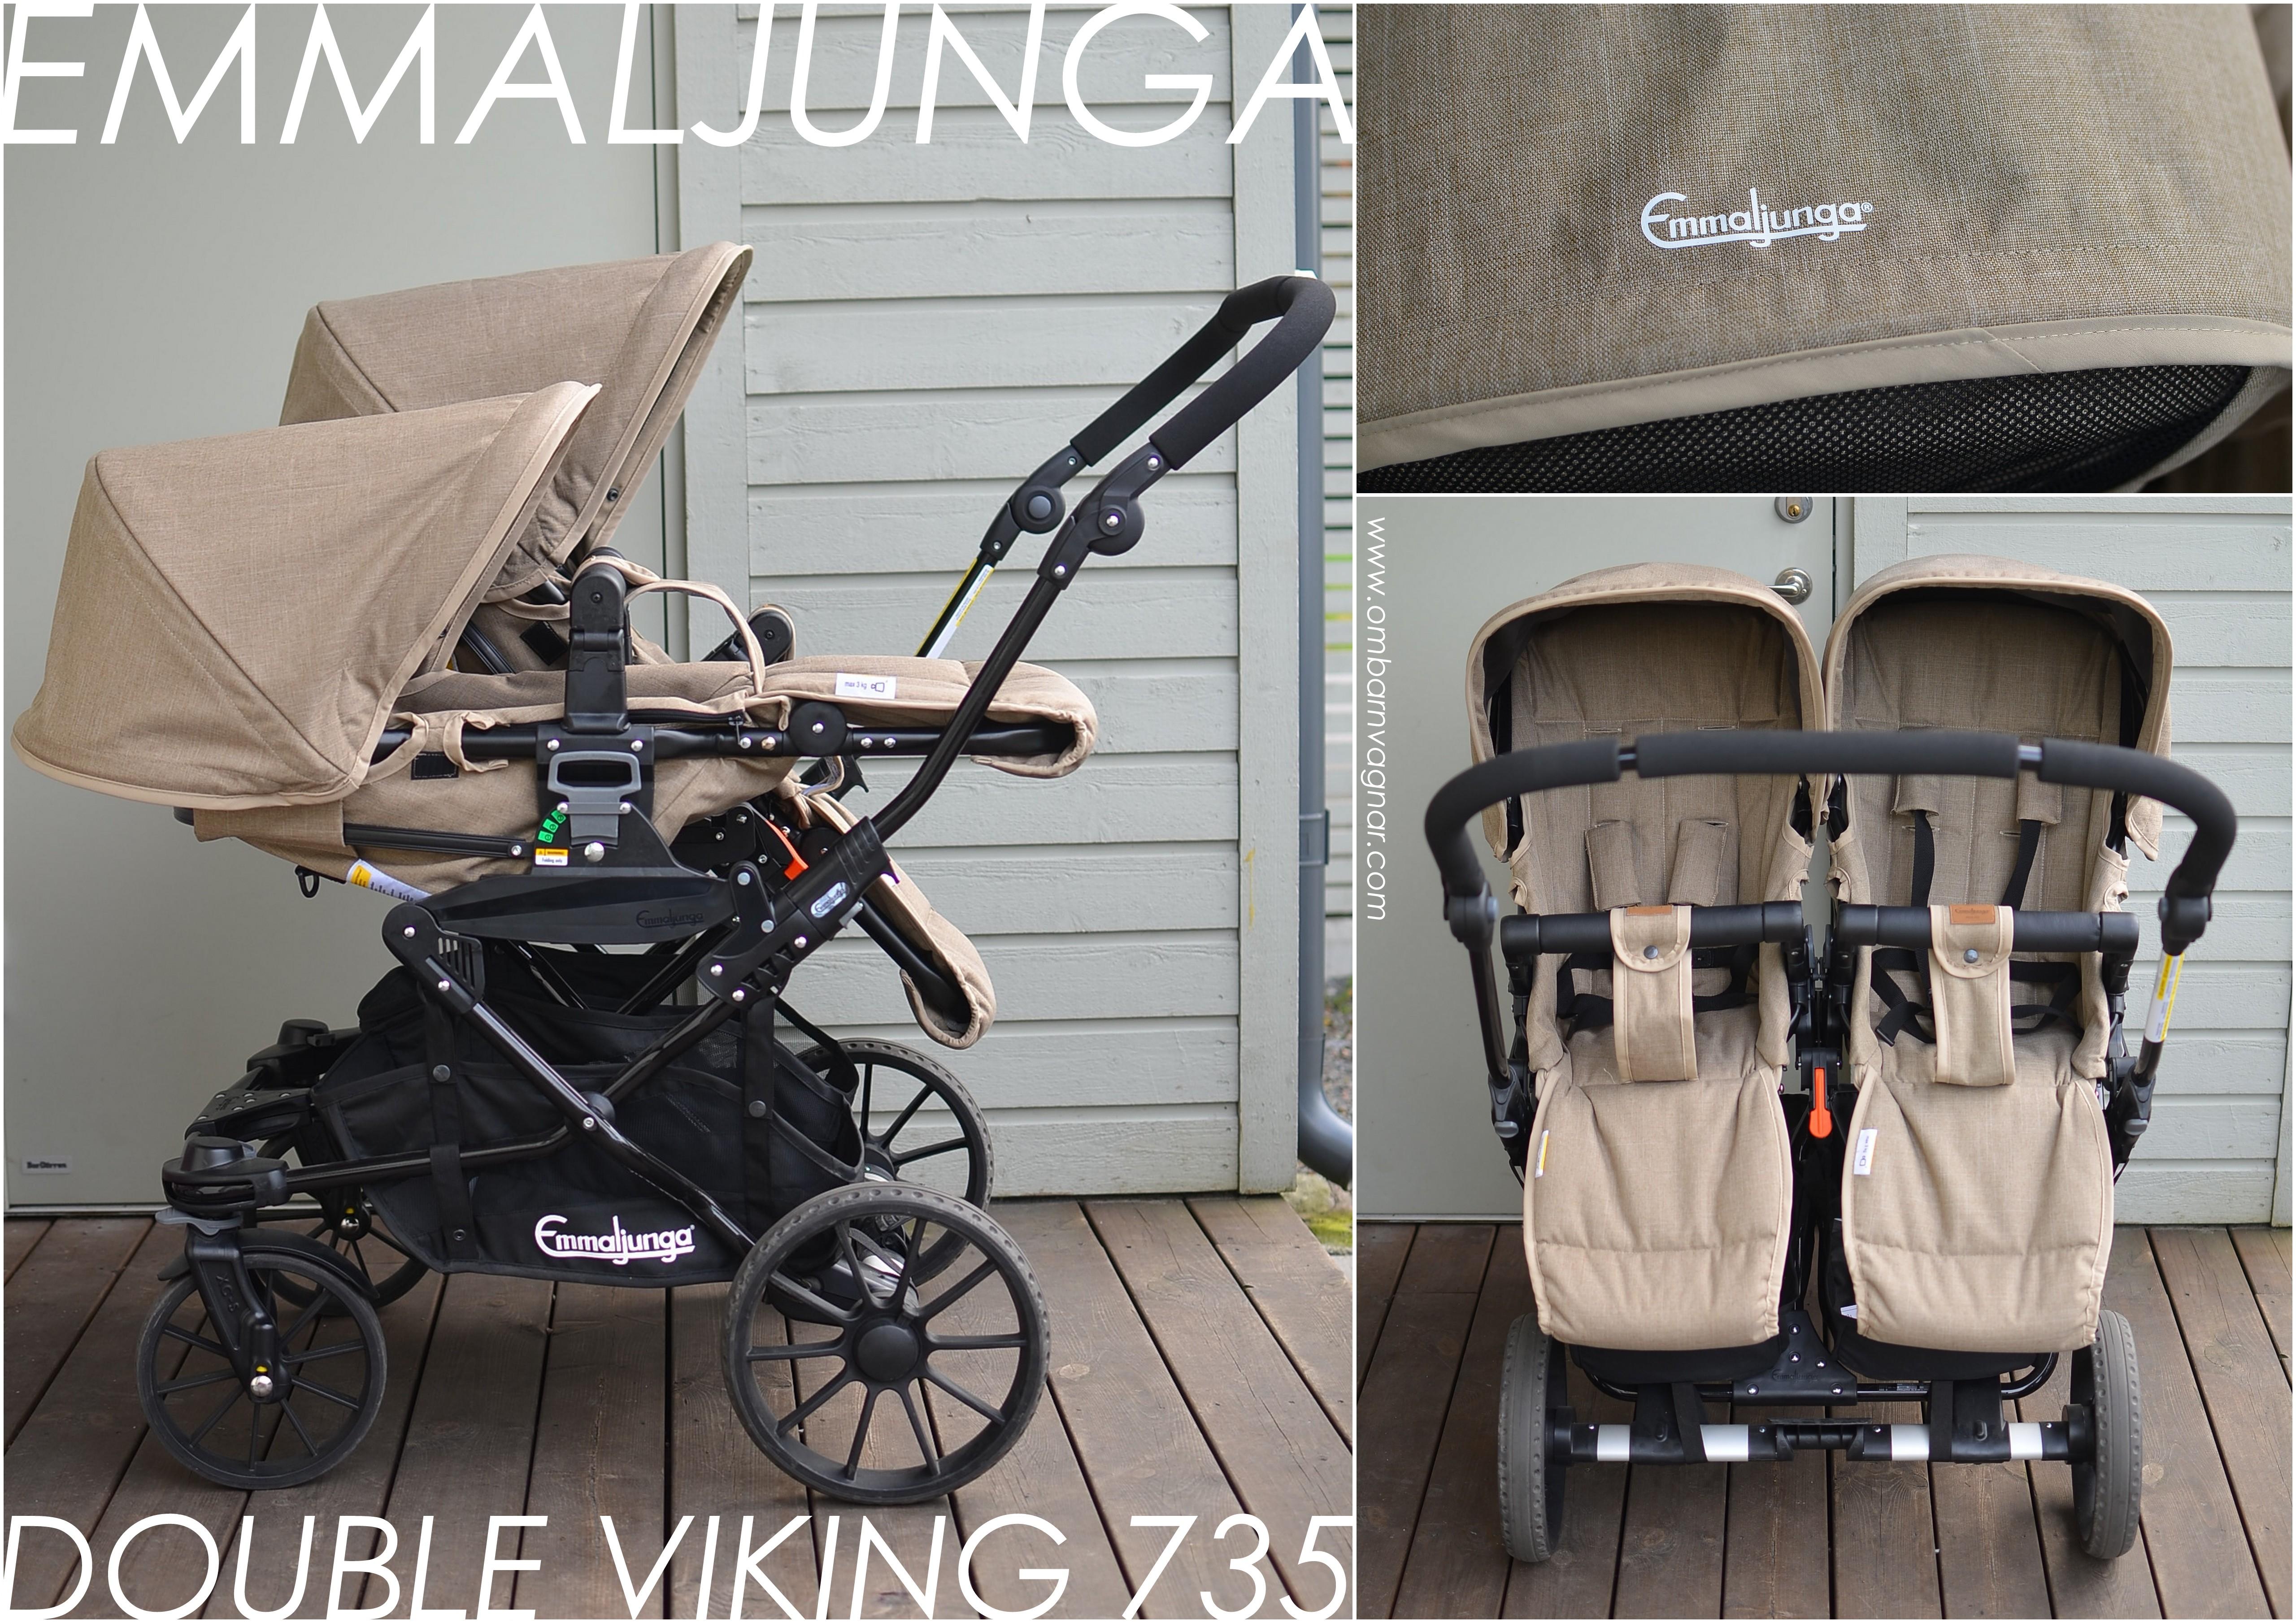 Emmaljunga Double Viking 735 Allt Om Barnvagnar